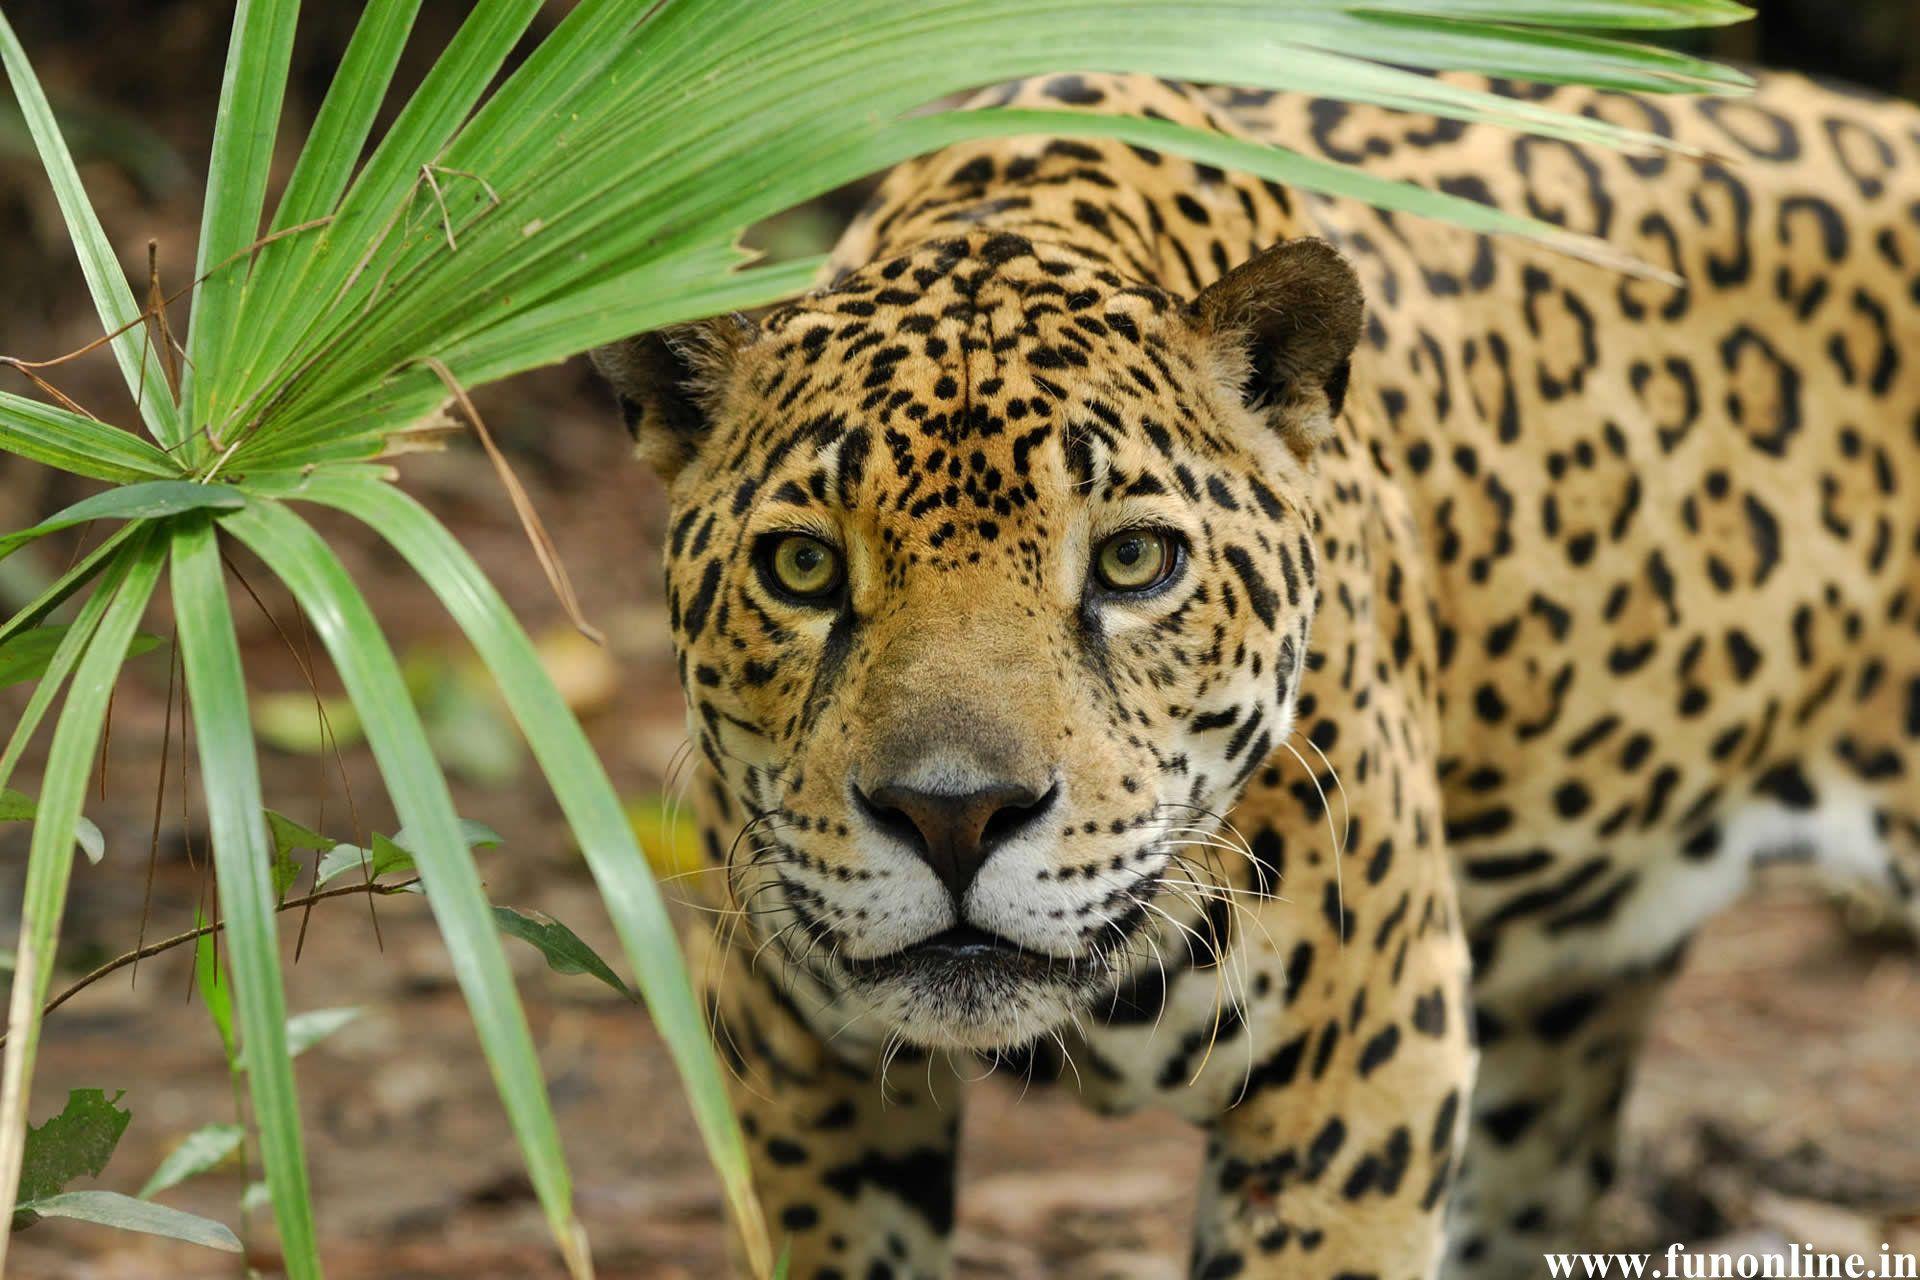 jaguar wallpapers, stunning jaguar hd wallpapers for free download